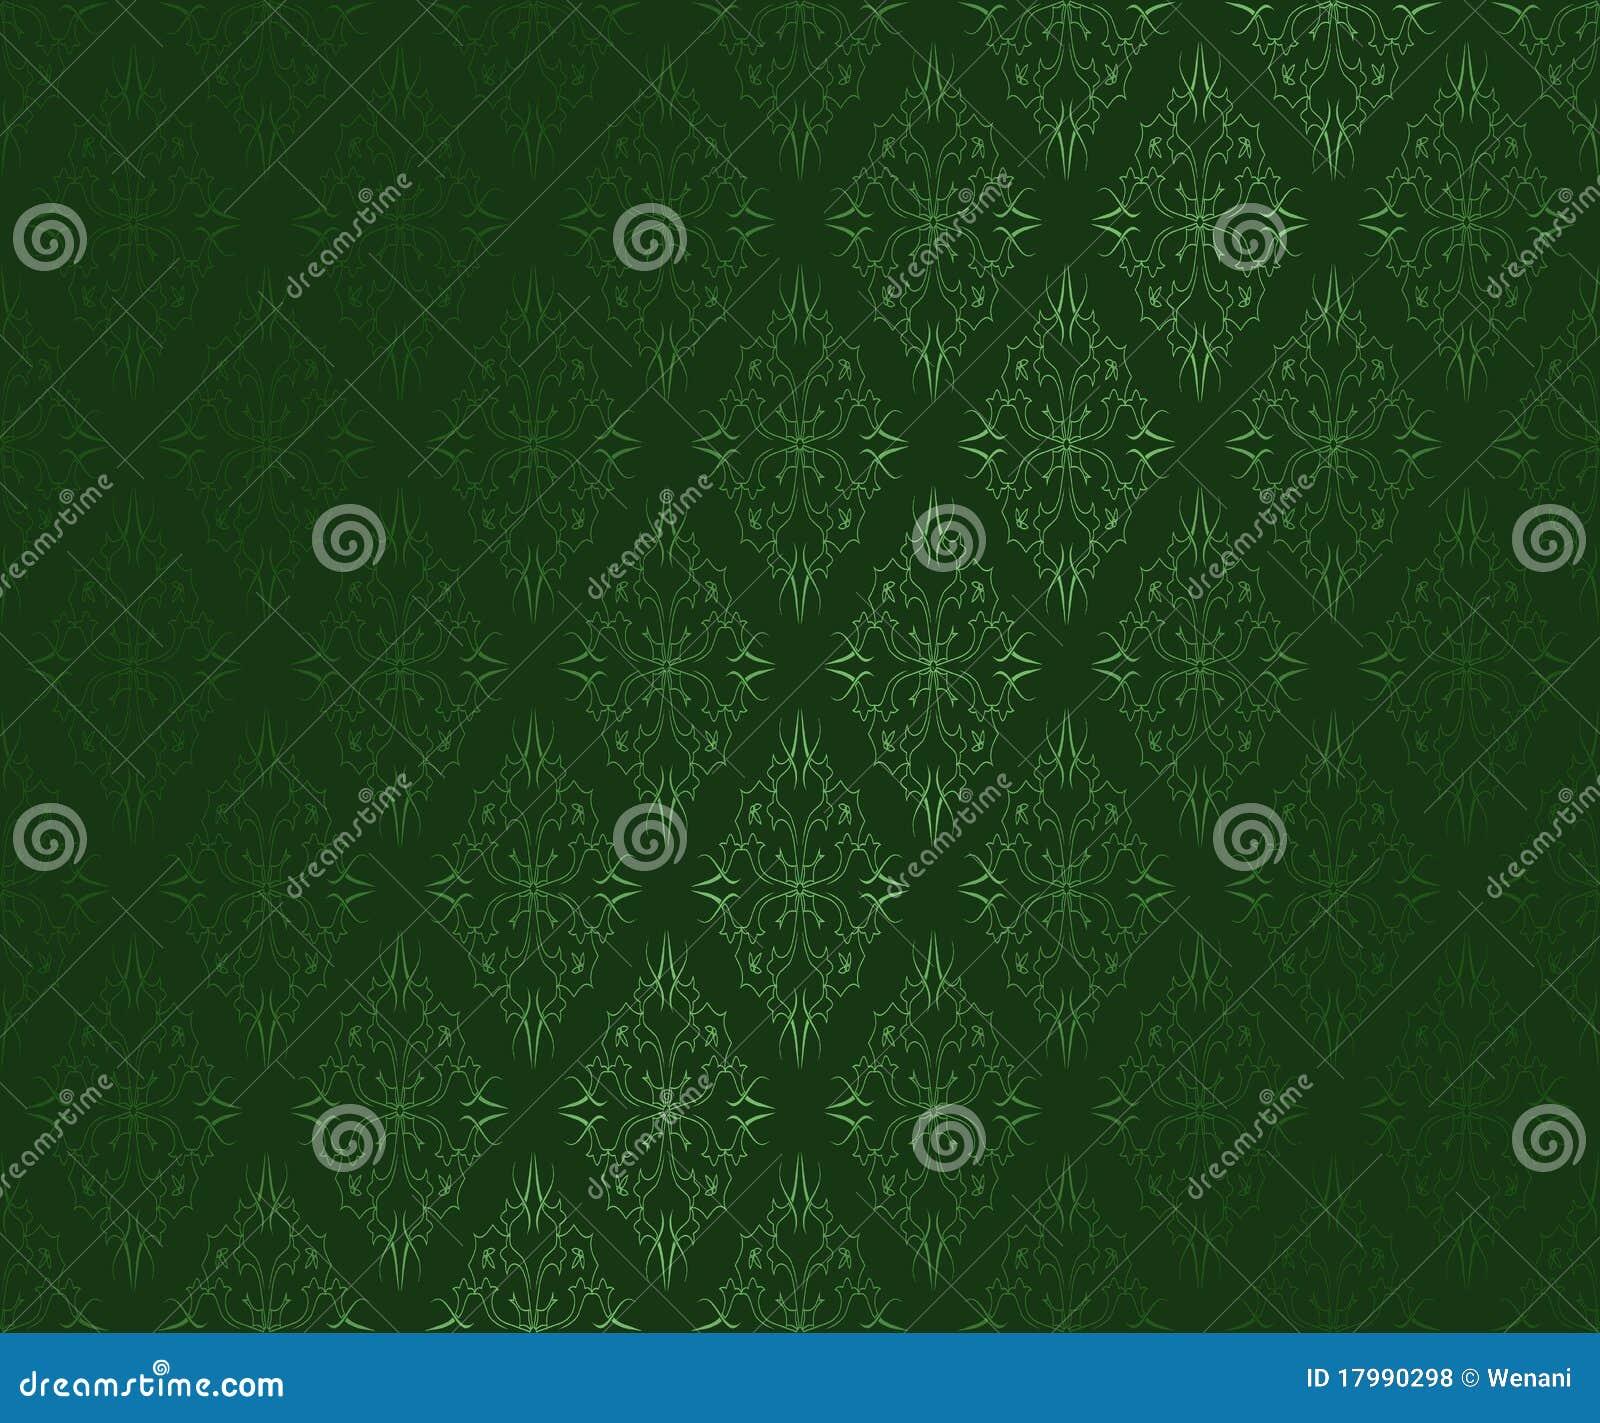 Dunkelgrune Dekorative Tapete Vektor Abbildung Illustration Von